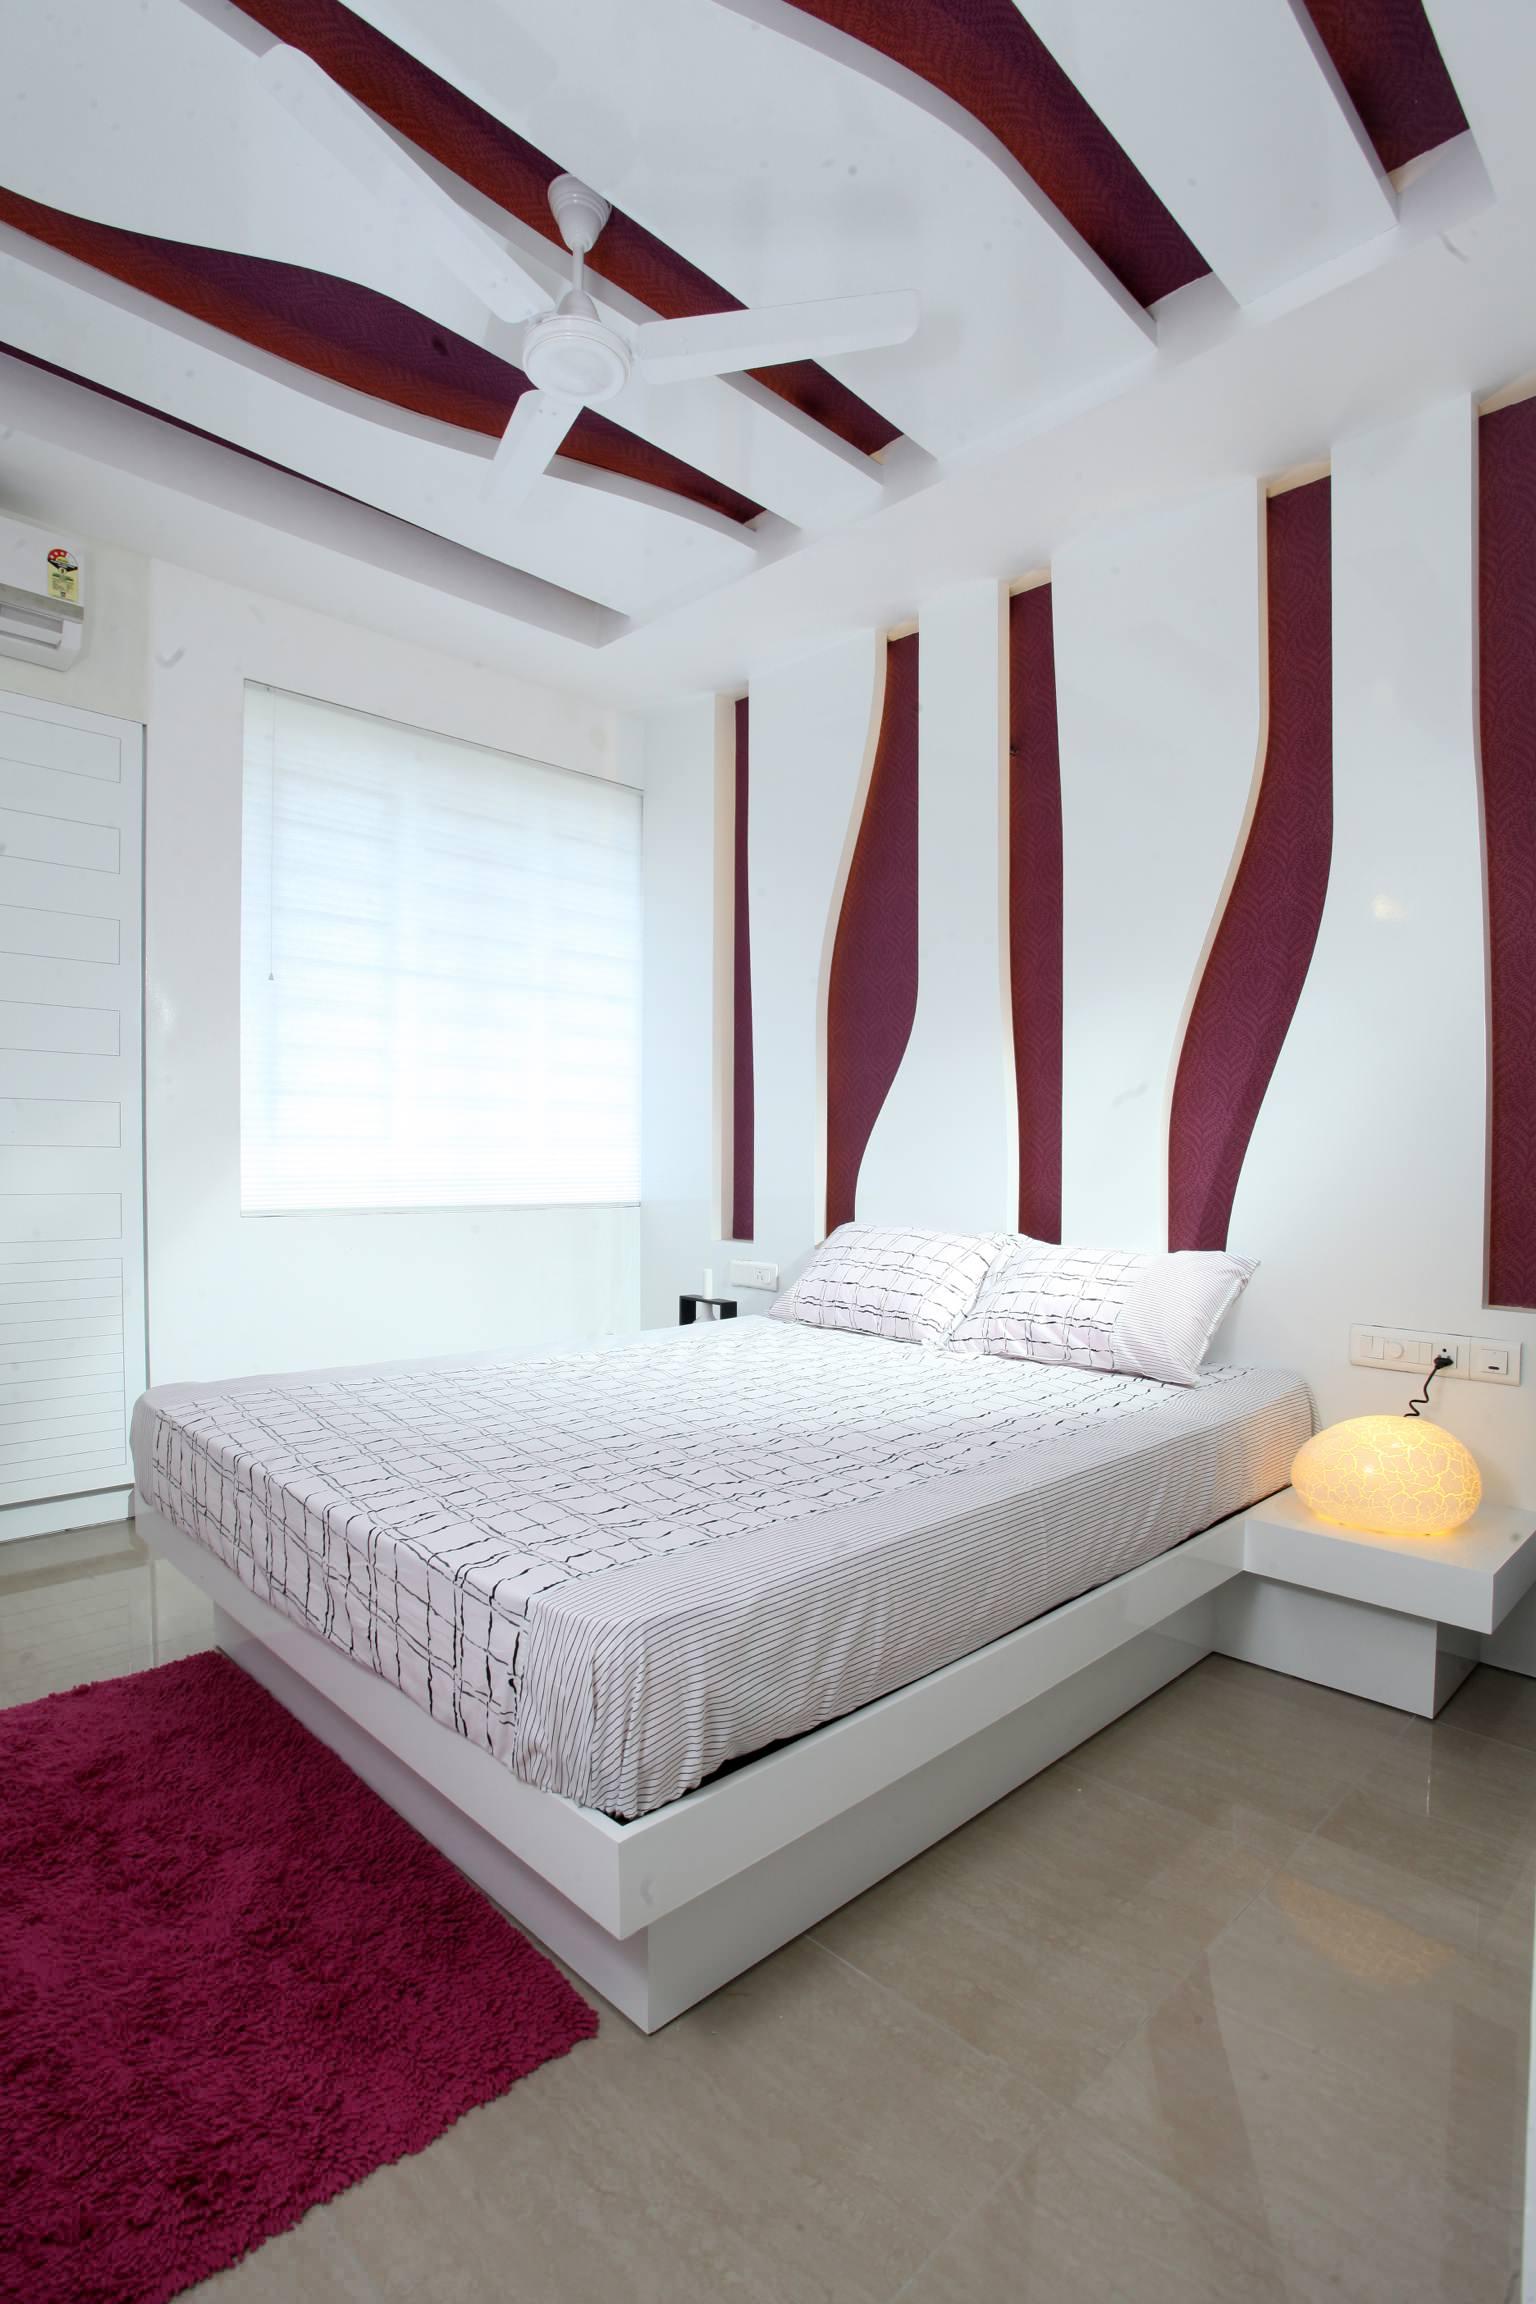 Interior Designing In Kerala Bedroom Ideas And Photos Houzz